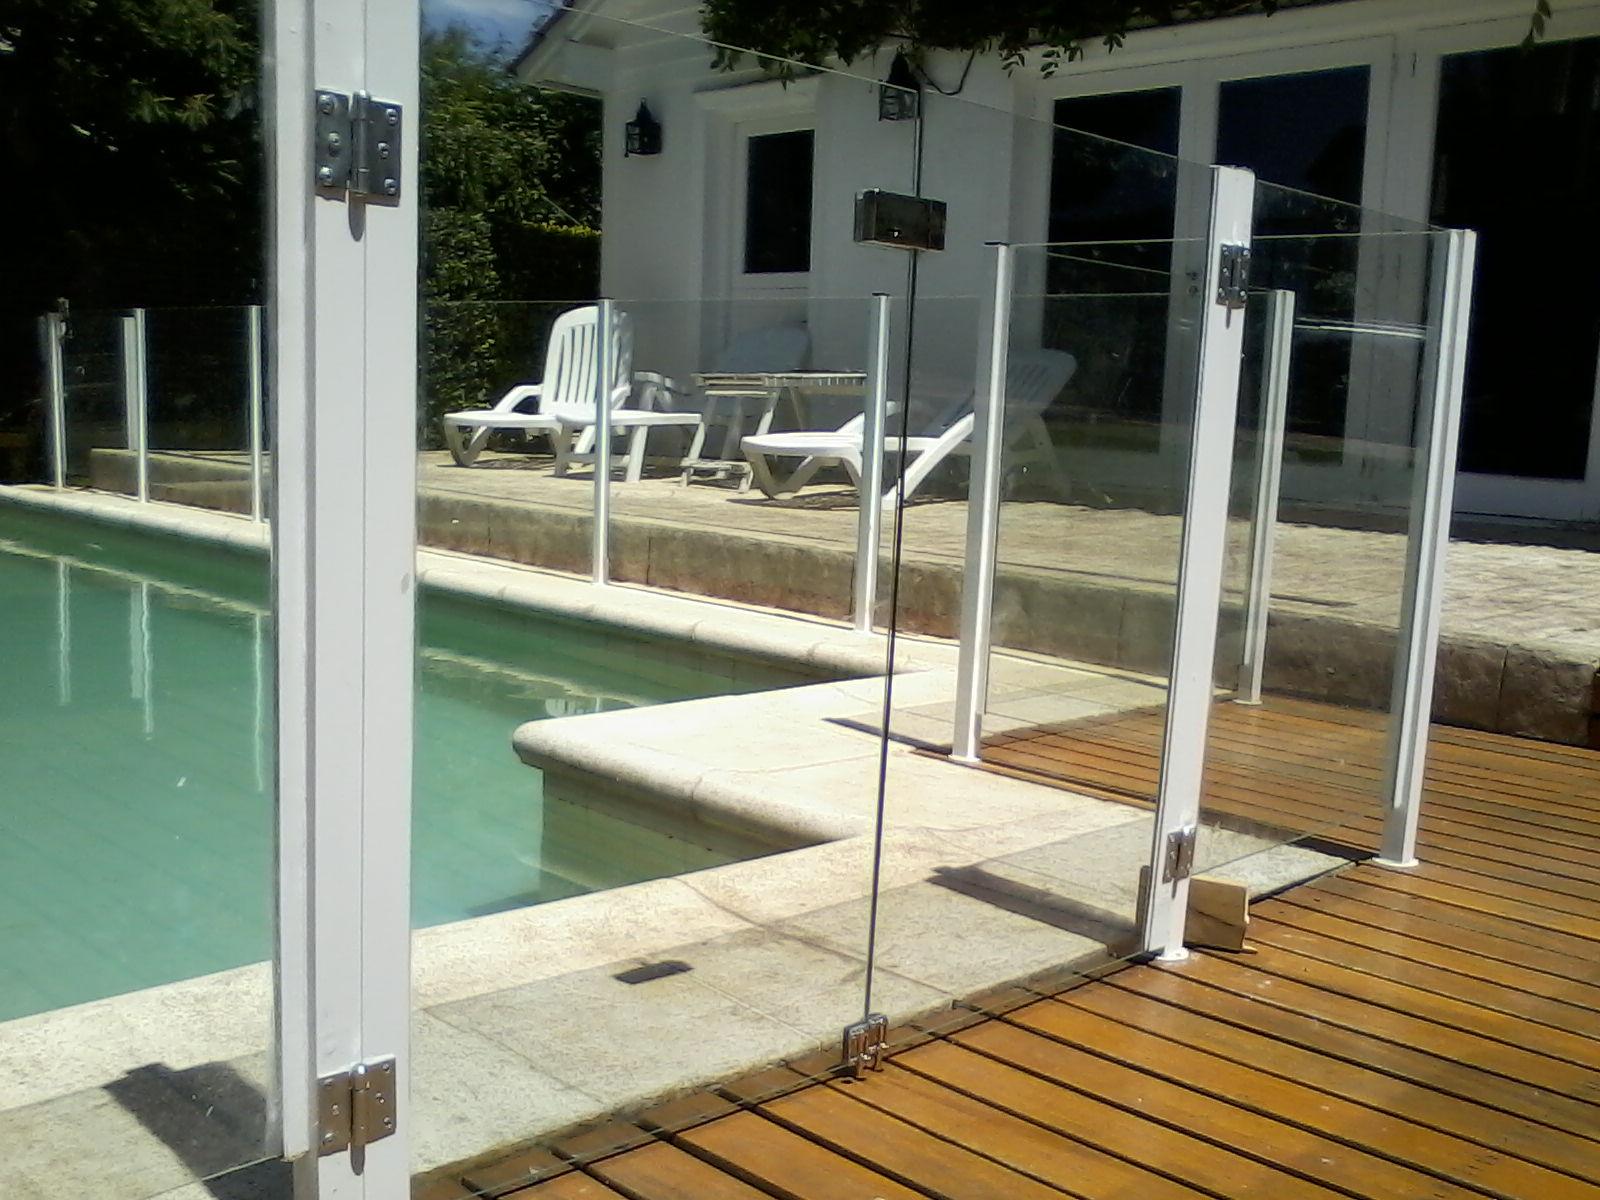 Sergio roveda cercos de vidrio laminado para piscinas - Vidrio para piscinas ...